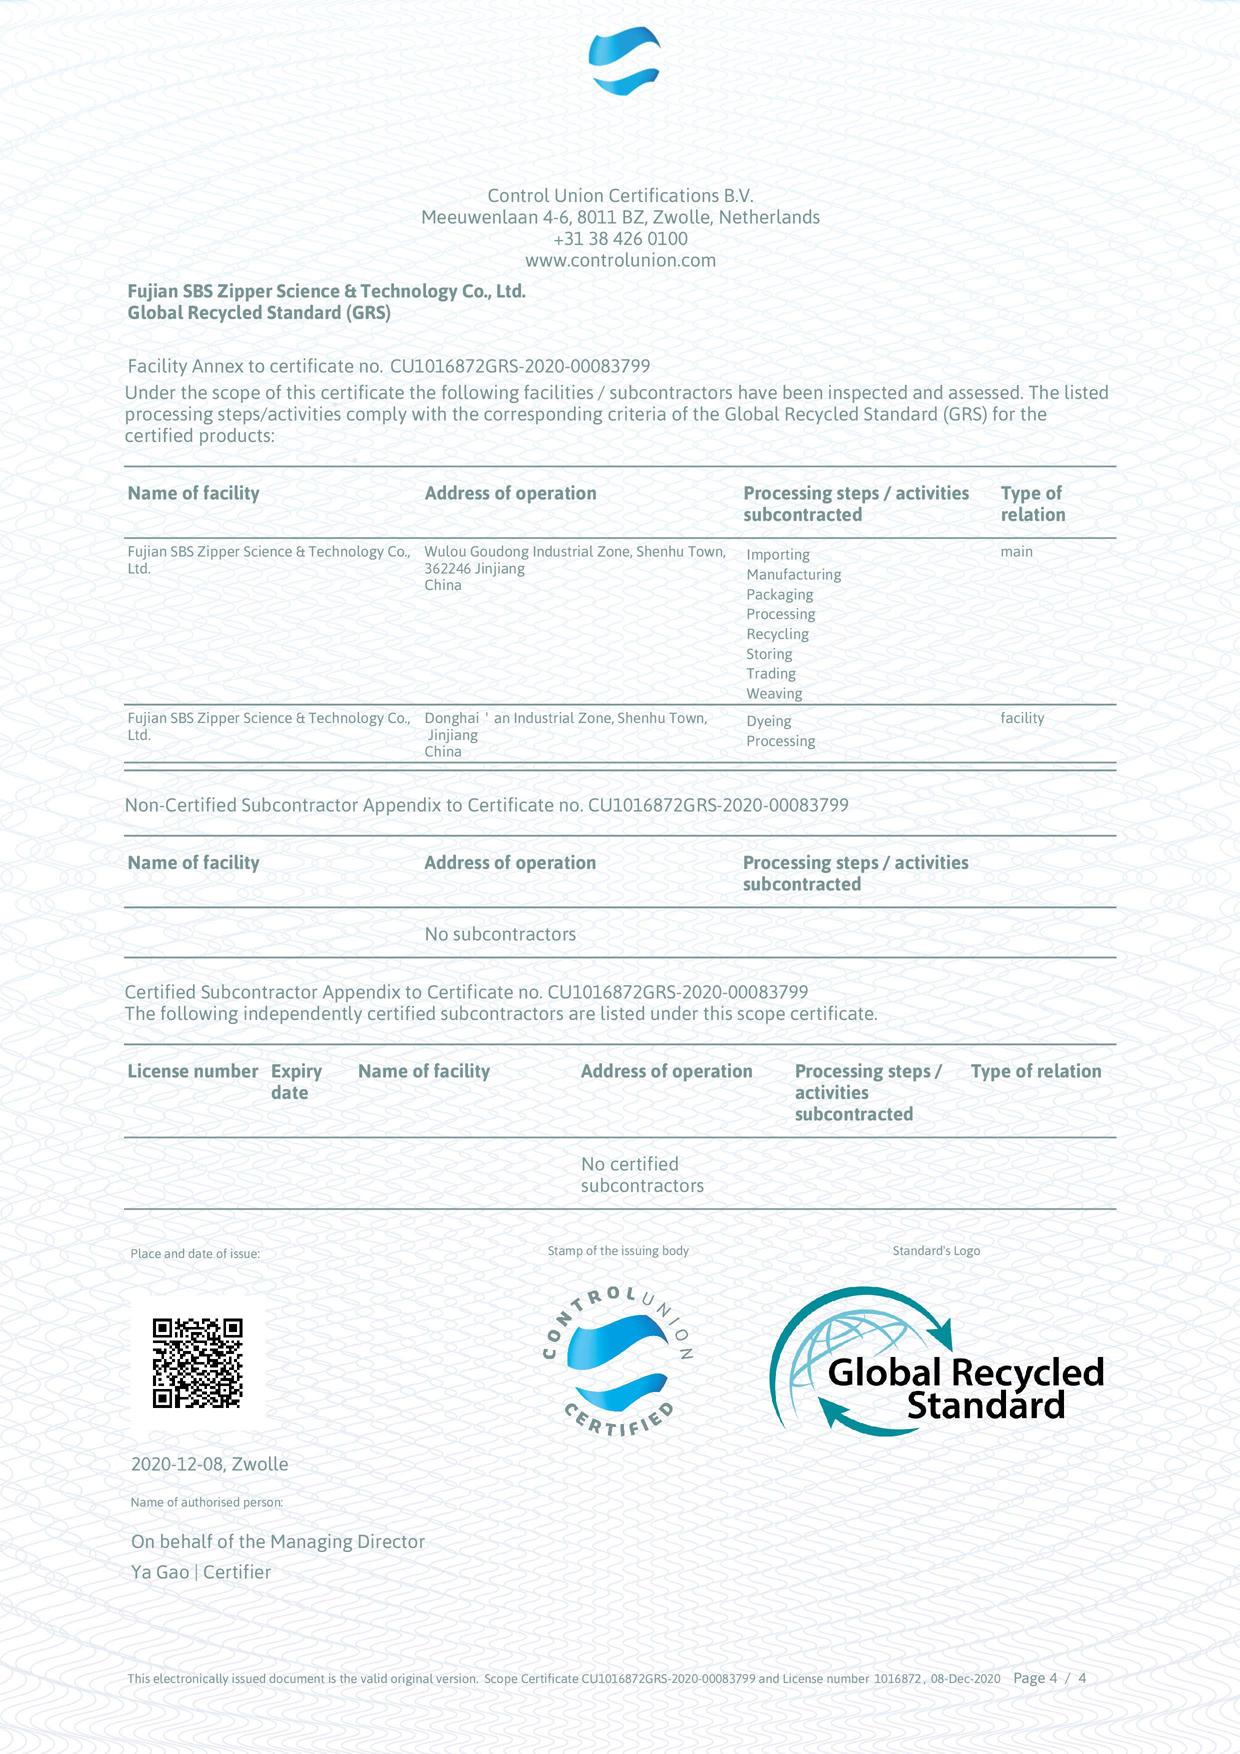 GRS_Scope_Certificate